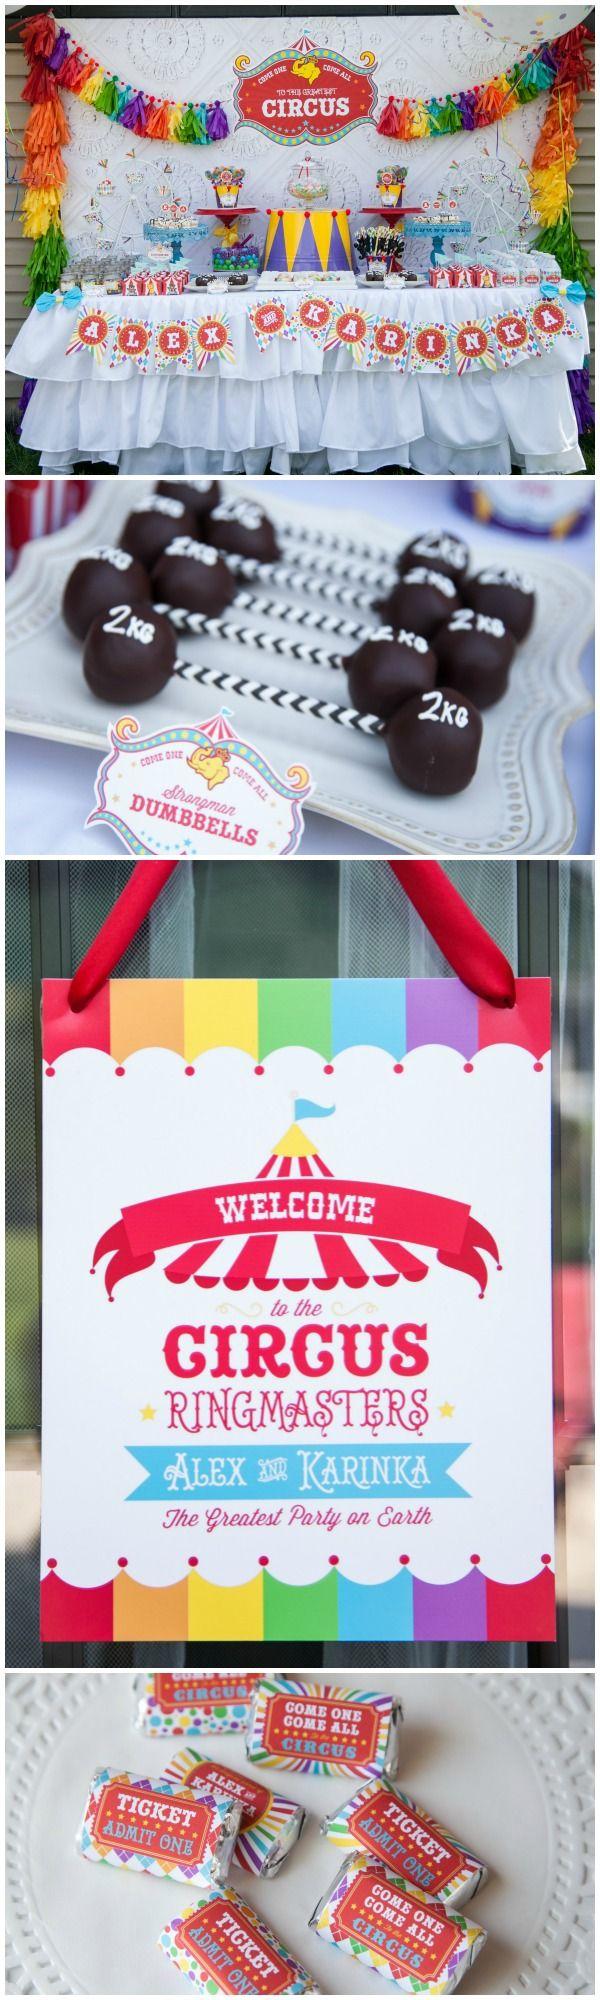 Circus Party Ideas (cutest strongman dumbbells!!)